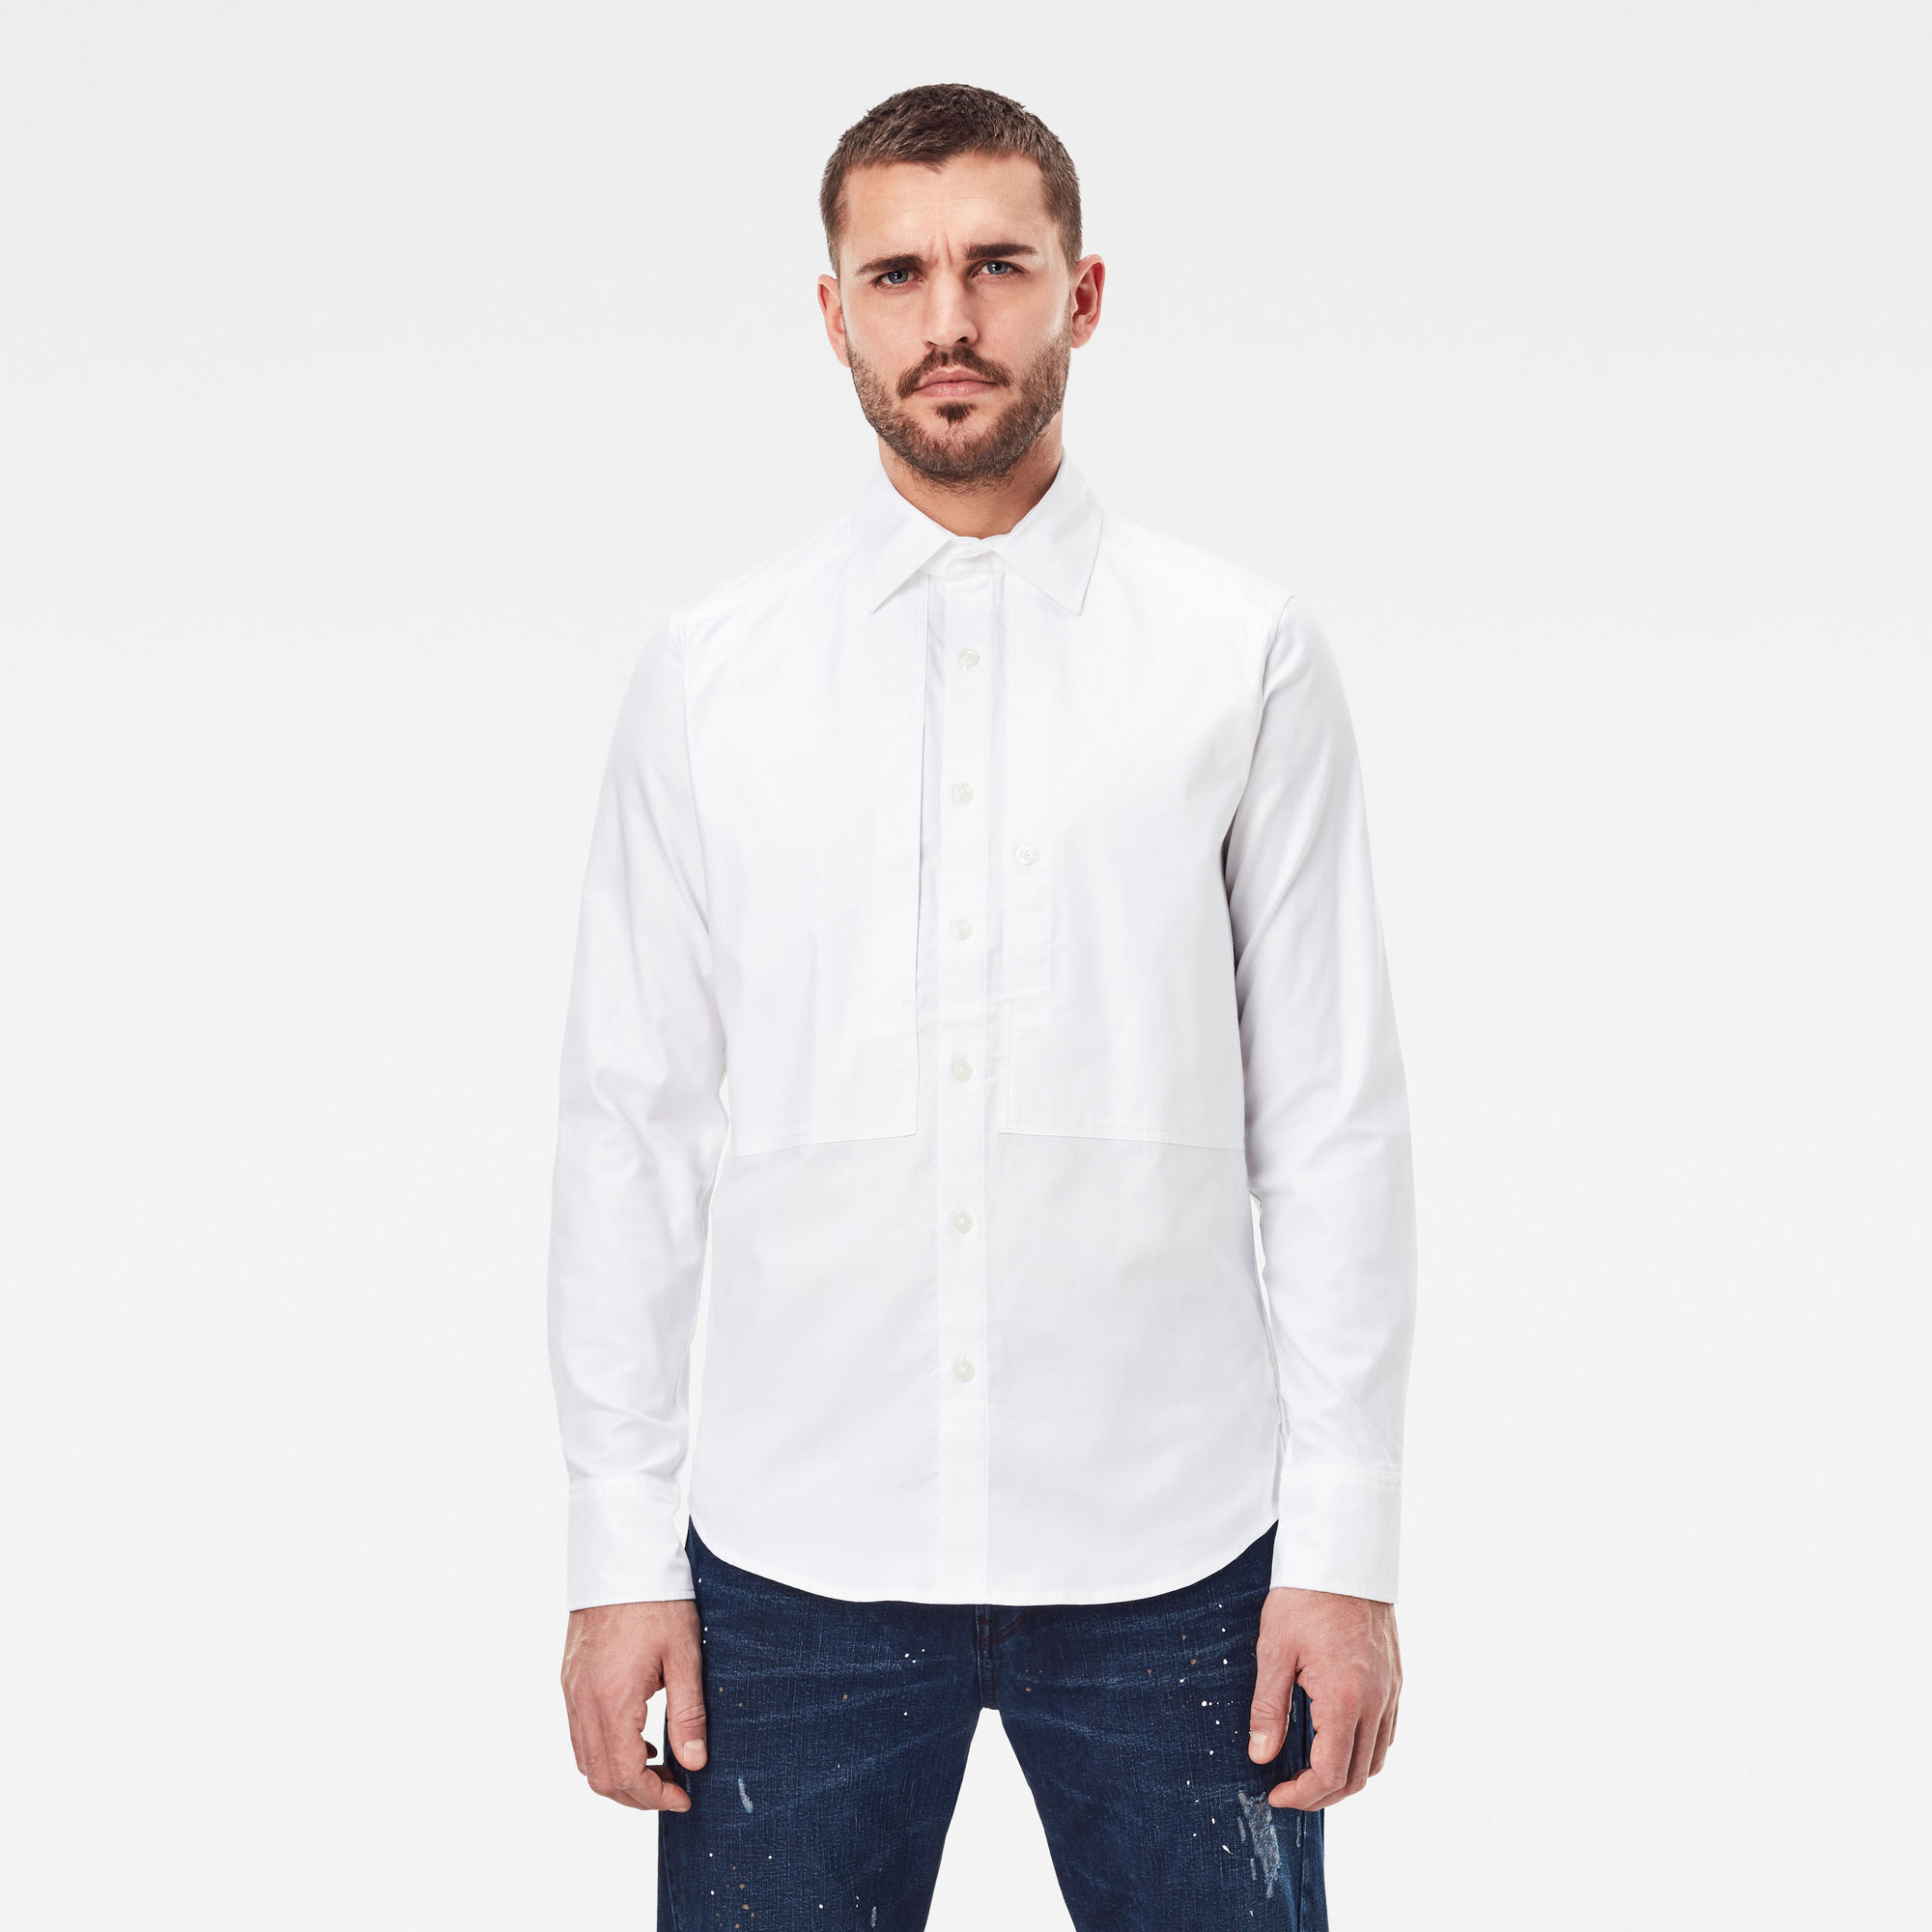 G-Star RAW Heren Panelled Pocket Slim Shirt Meerkleurig